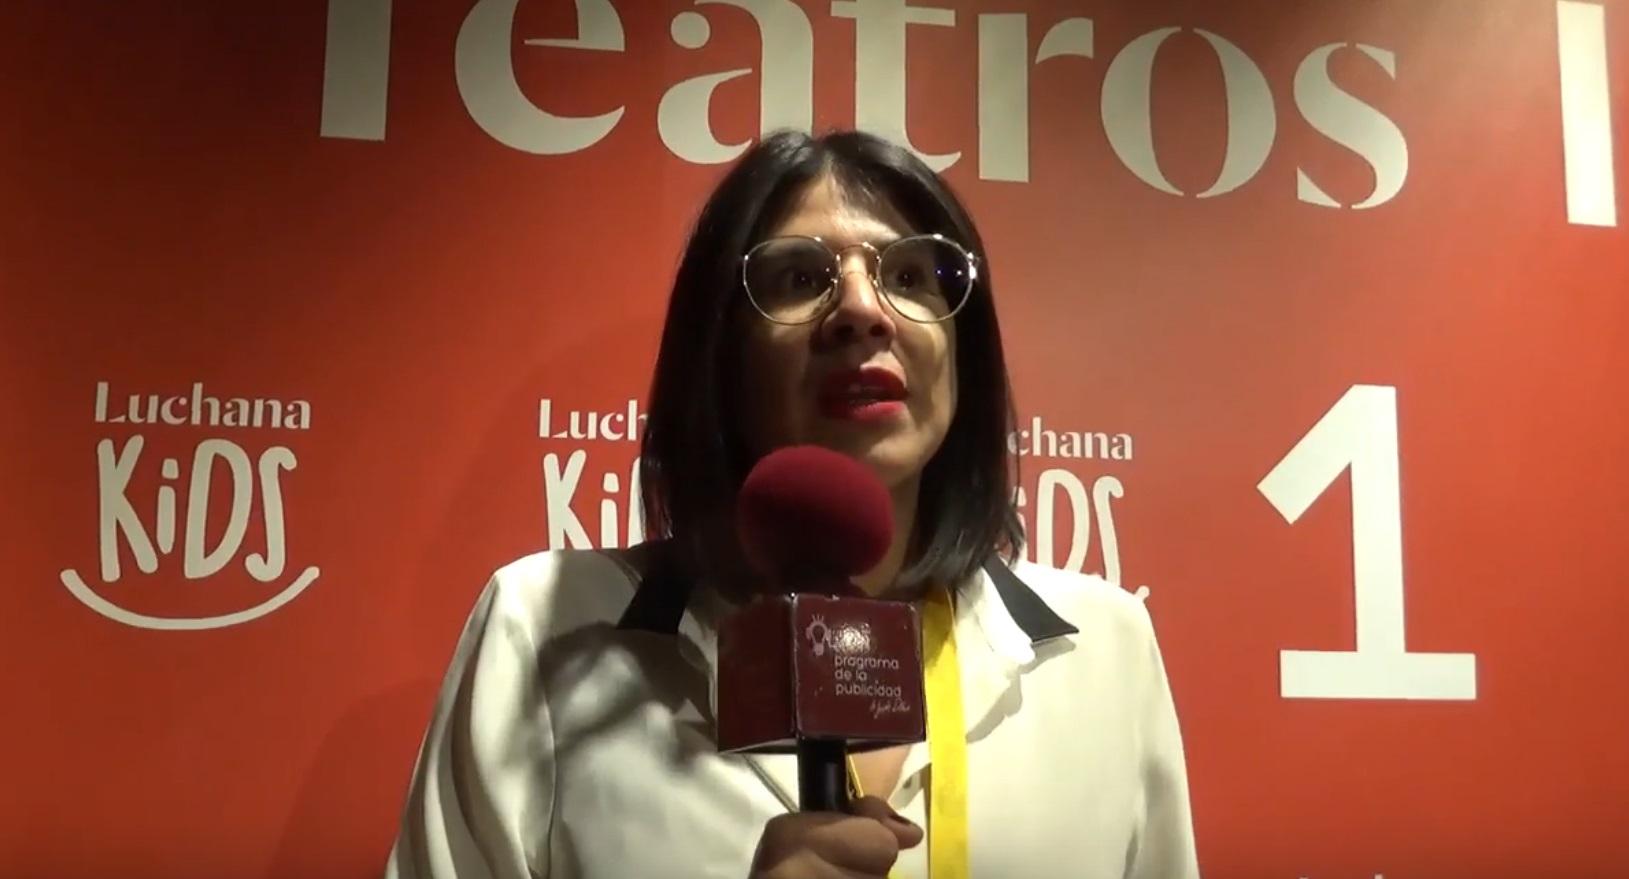 https://www.programapublicidad.com/wp-content/uploads/2019/10/Ruth-Henriquez-Responsable-Marketing-Mattel-España-programapublicidad-muy-grande.jpg